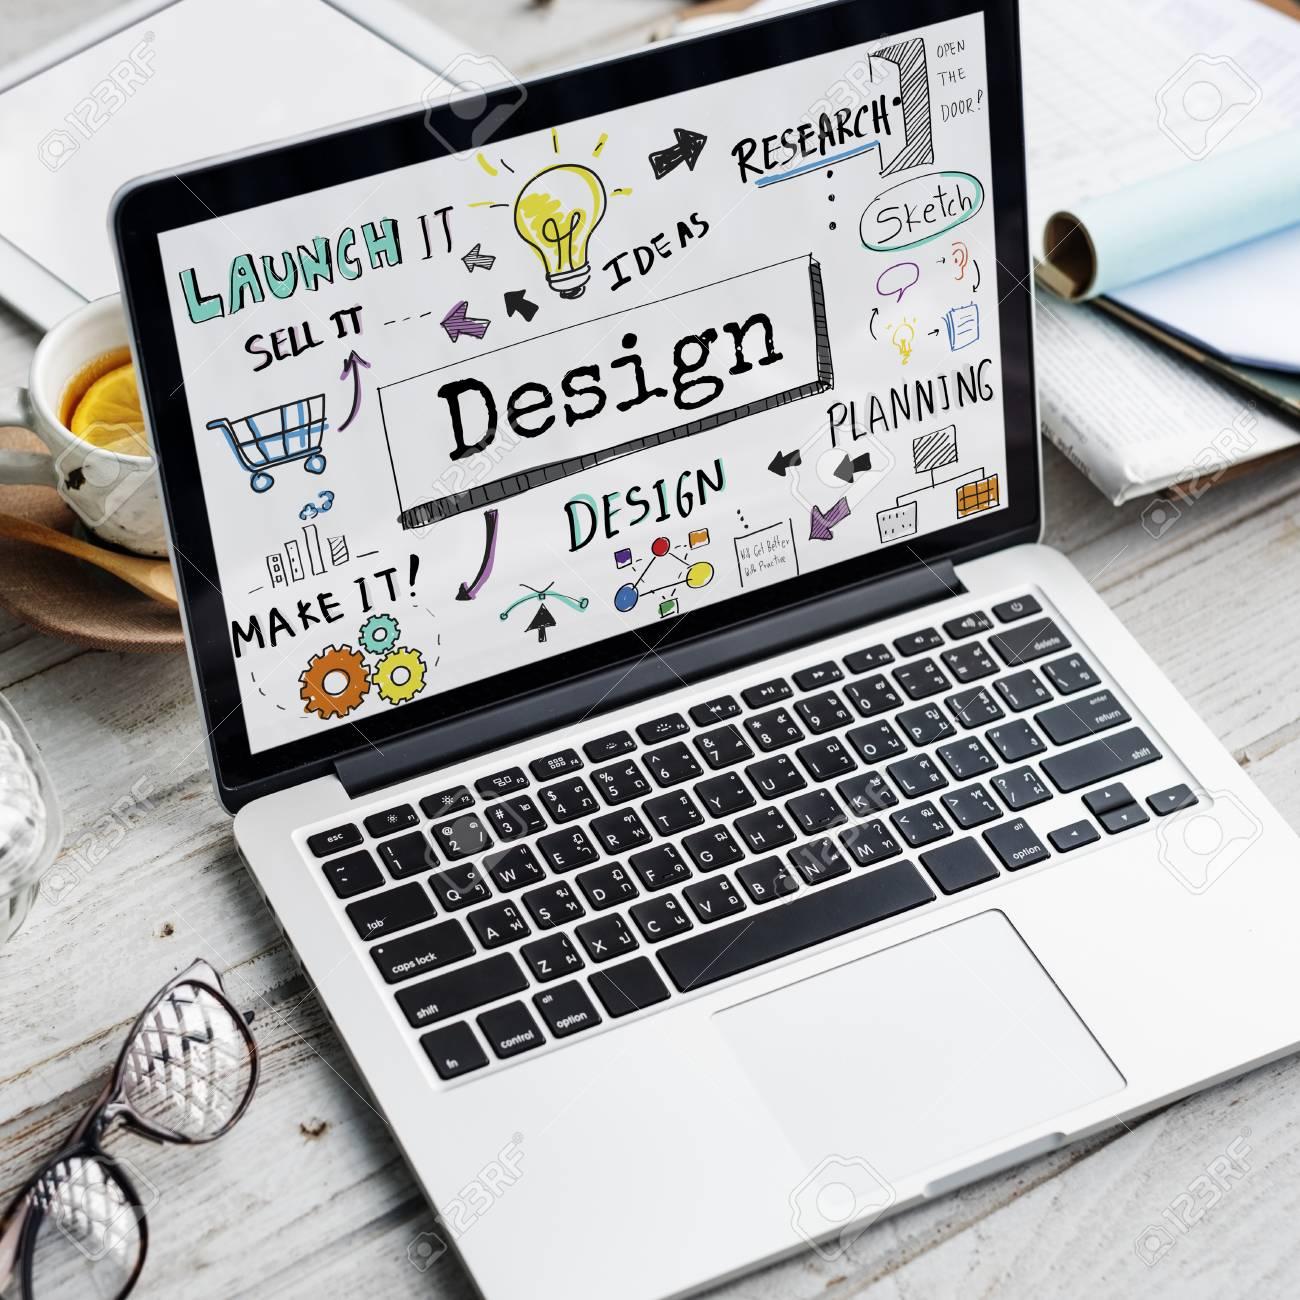 Design Creative Ideas Objective Planning Sketch Concept Stock Photo - 67124133